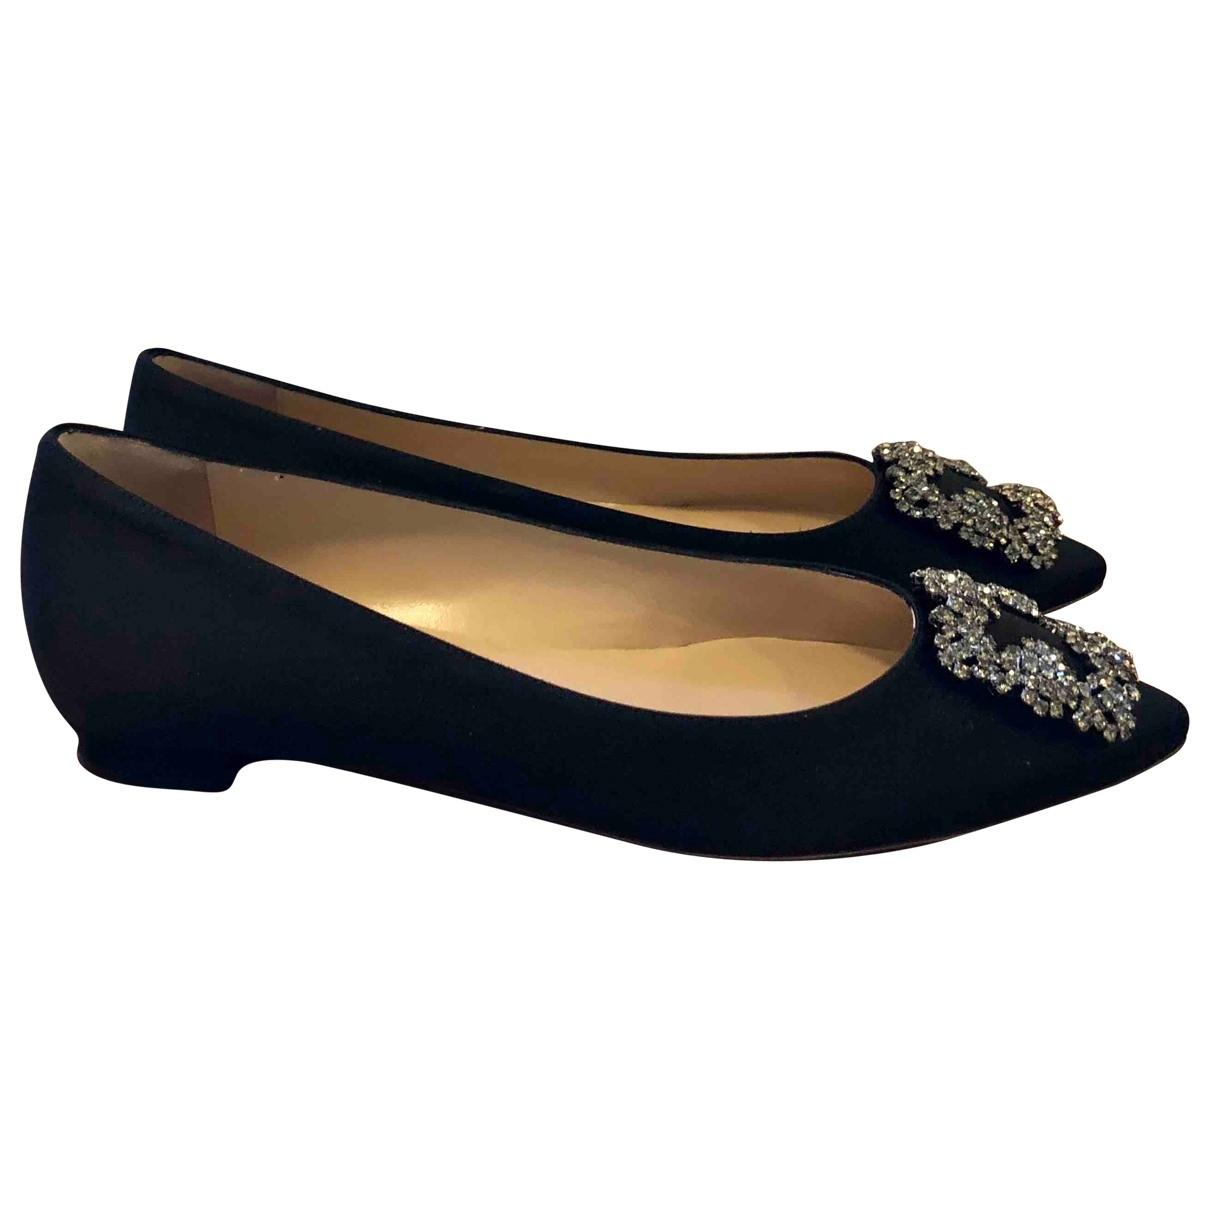 Manolo Blahnik \N Black Cloth Ballet flats for Women 38 EU